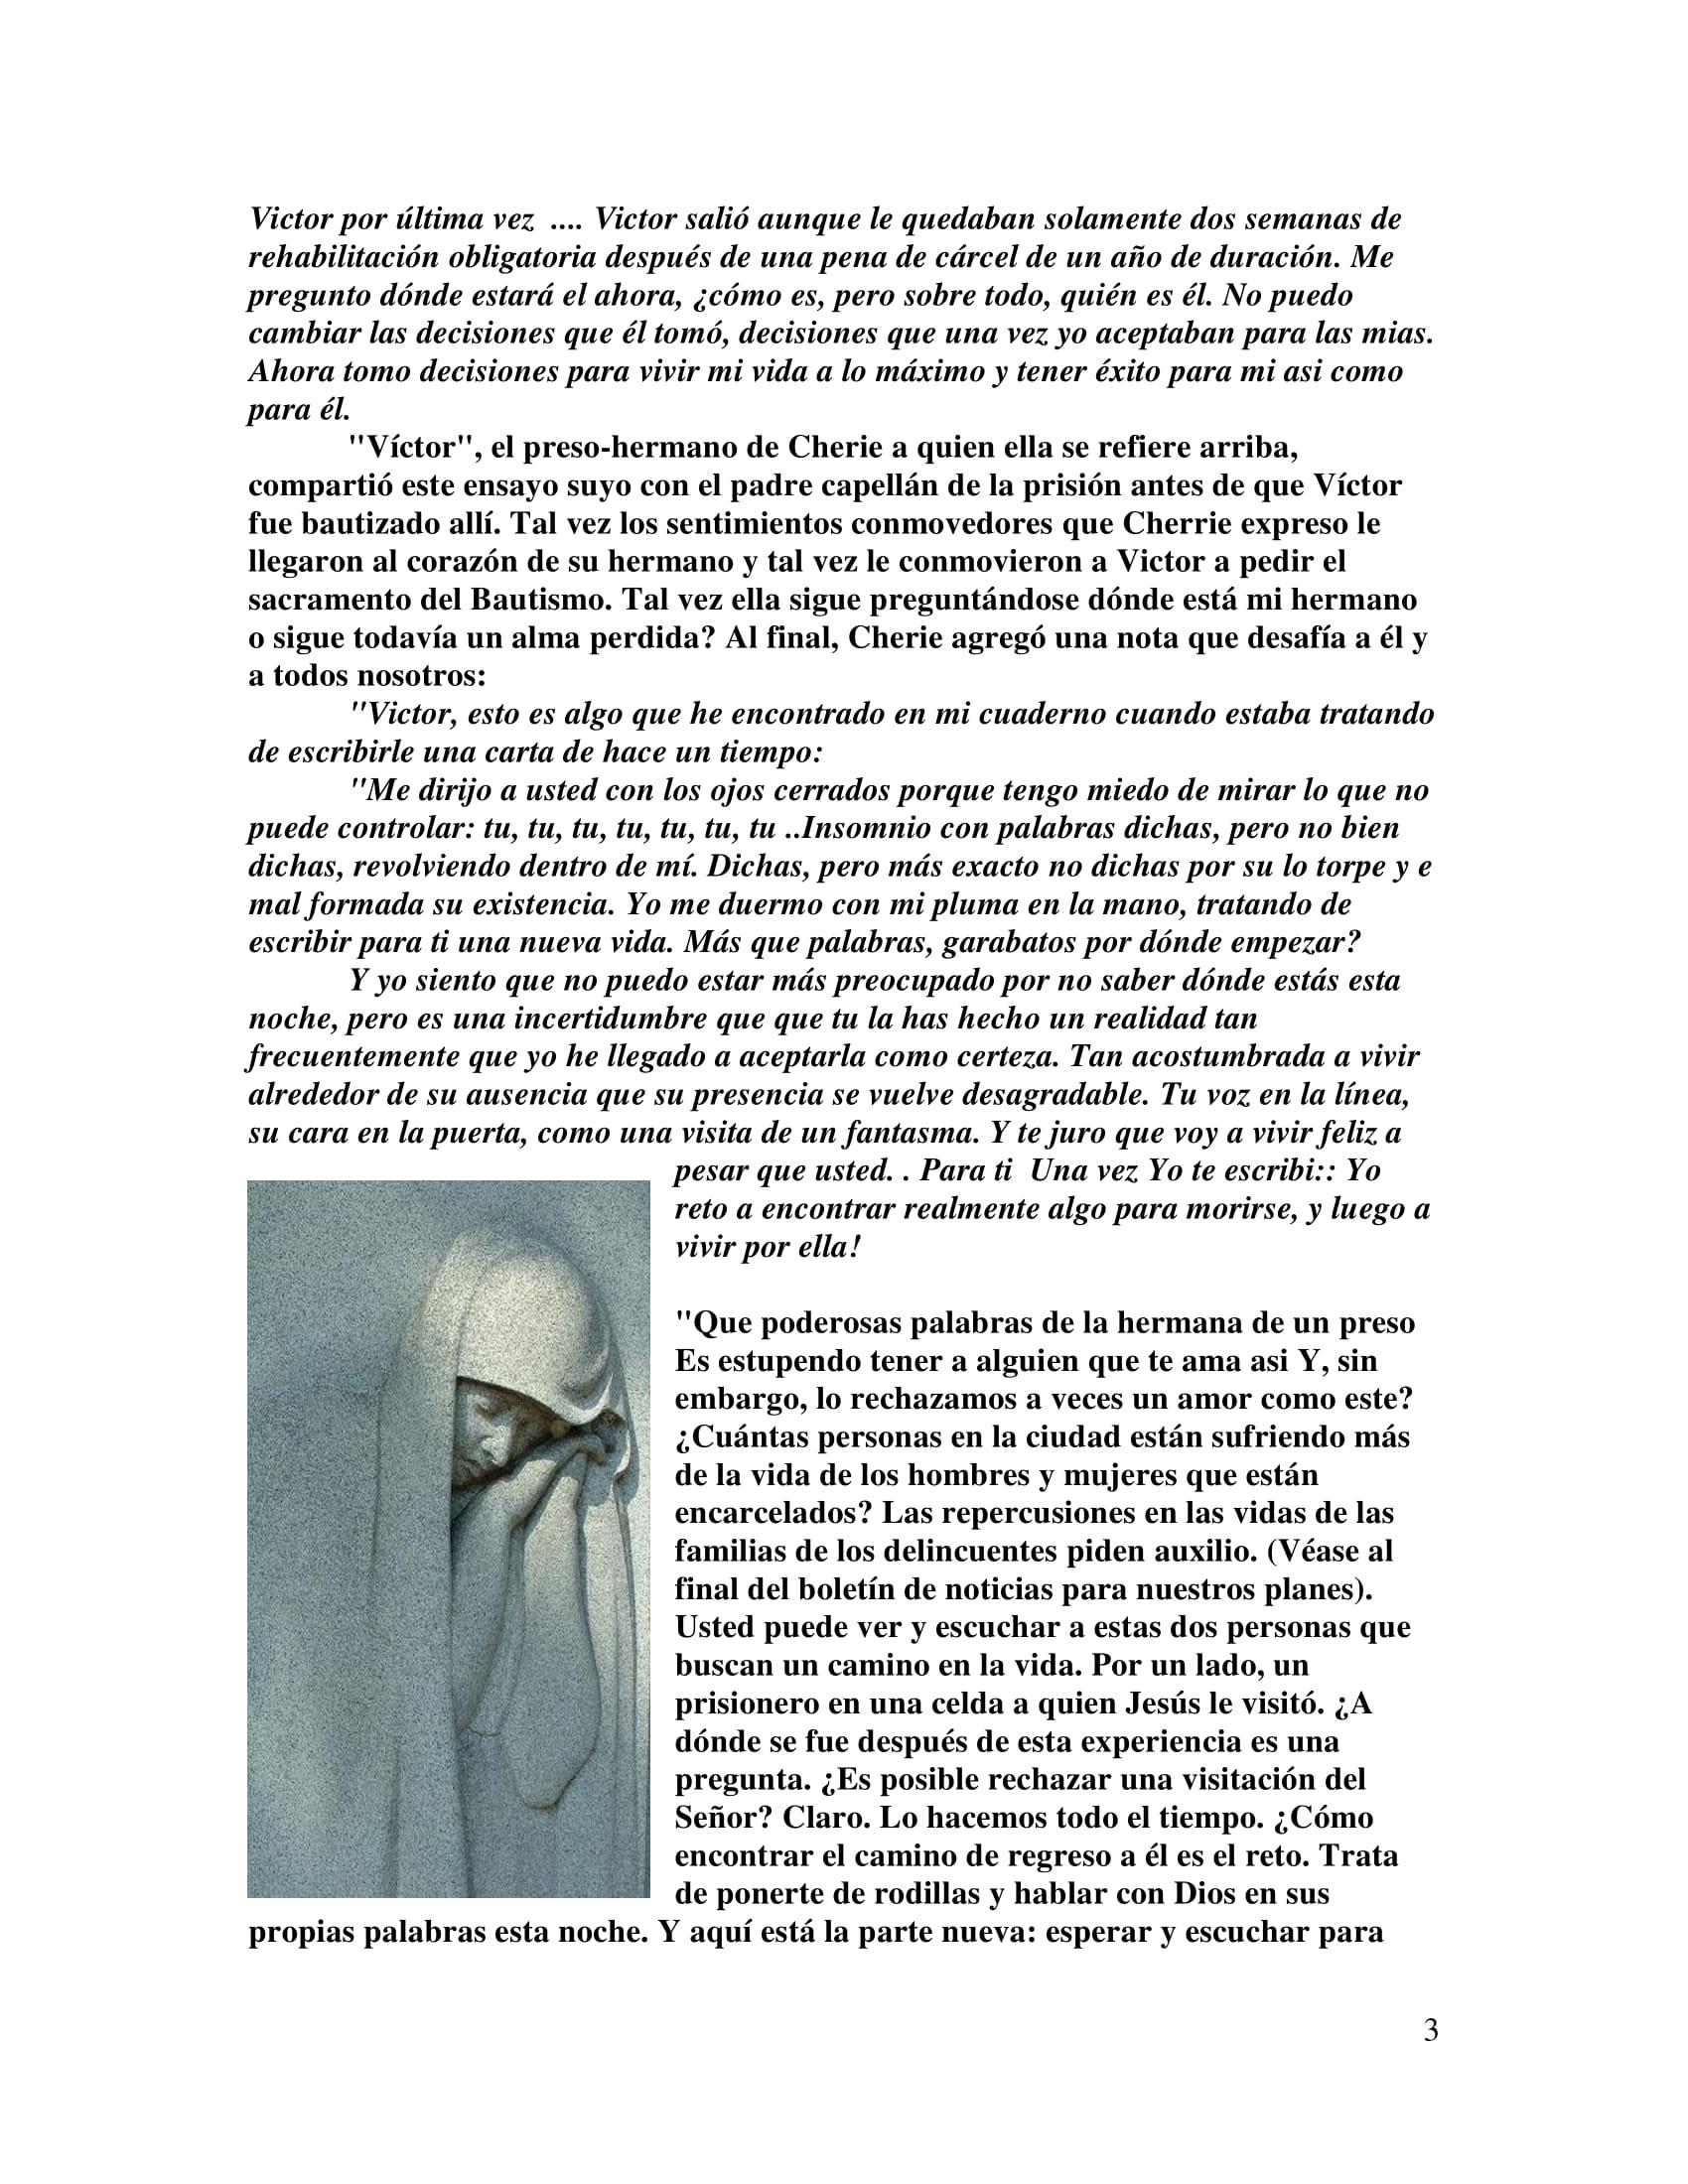 Voices From Prison 12 Spanish-3.jpg